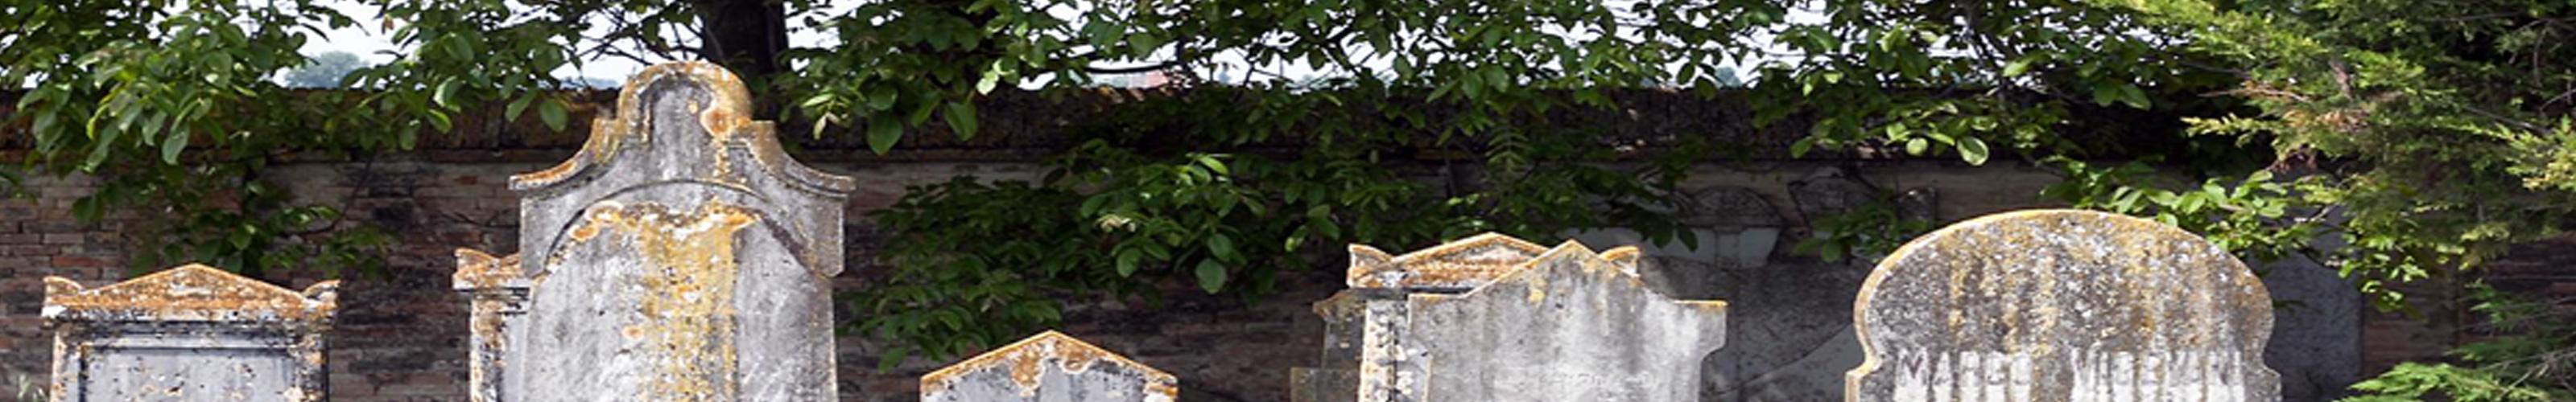 cimitero 005